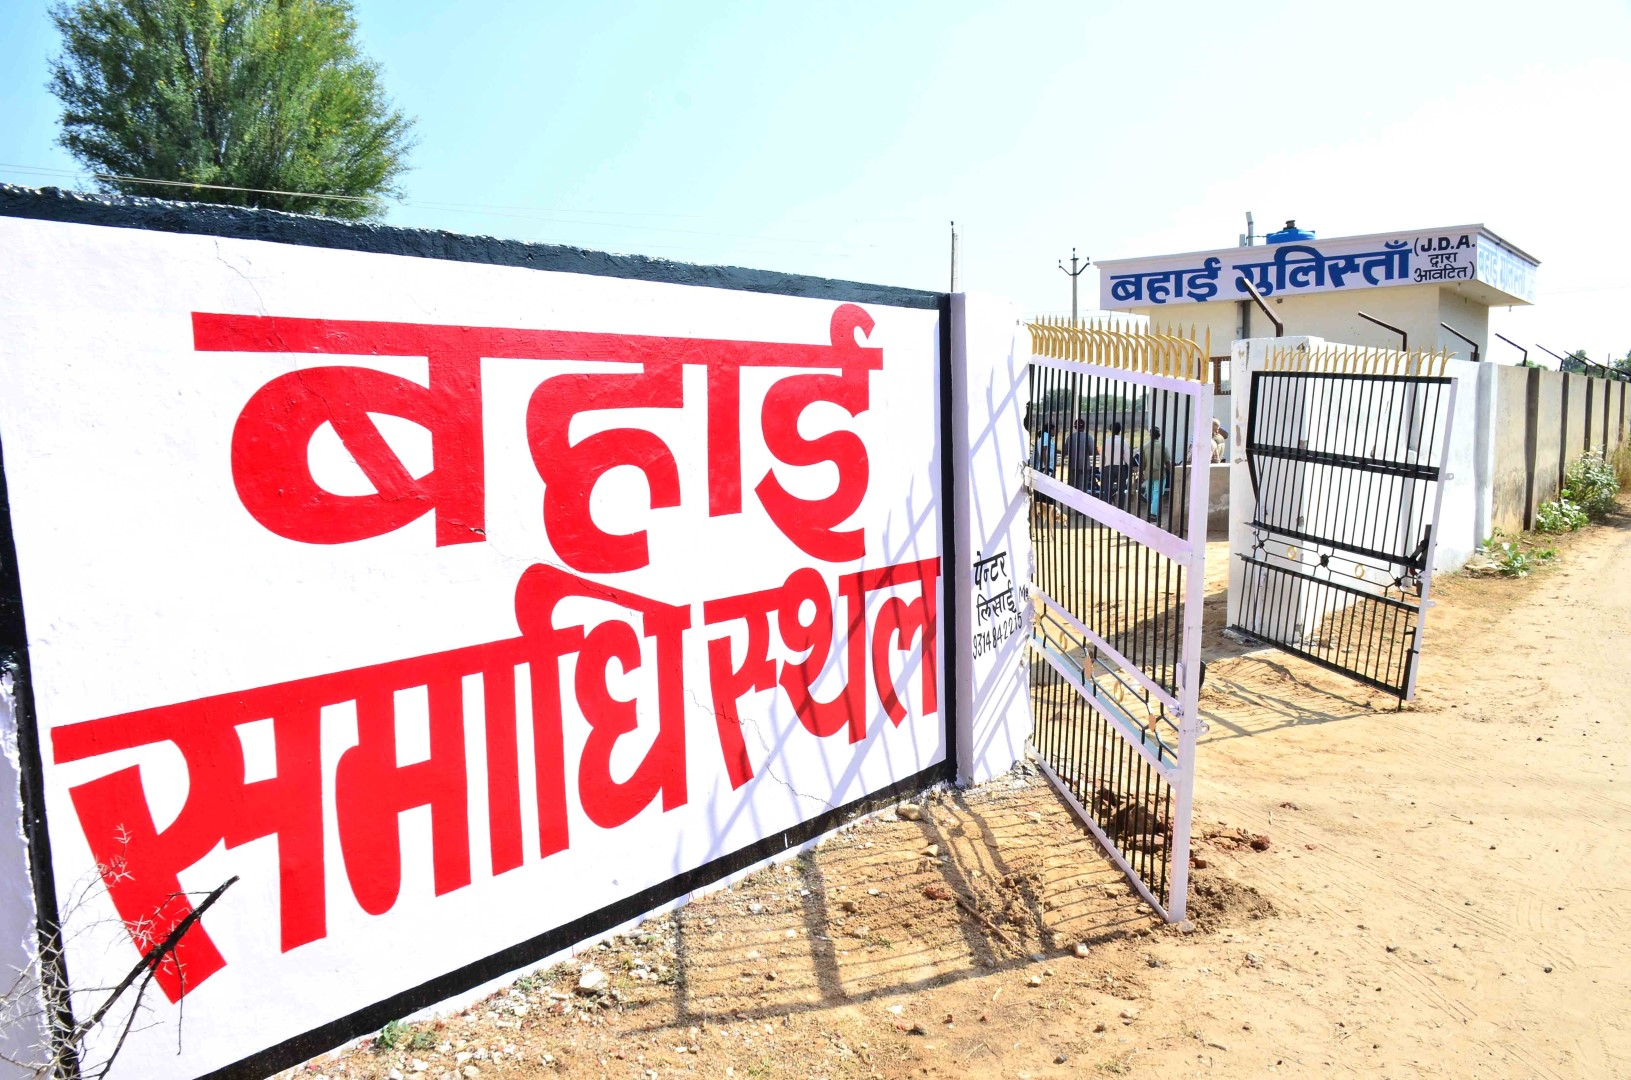 Baha'i Burial Ground Vandalised, Hand of BJP Sarpanch Alleged